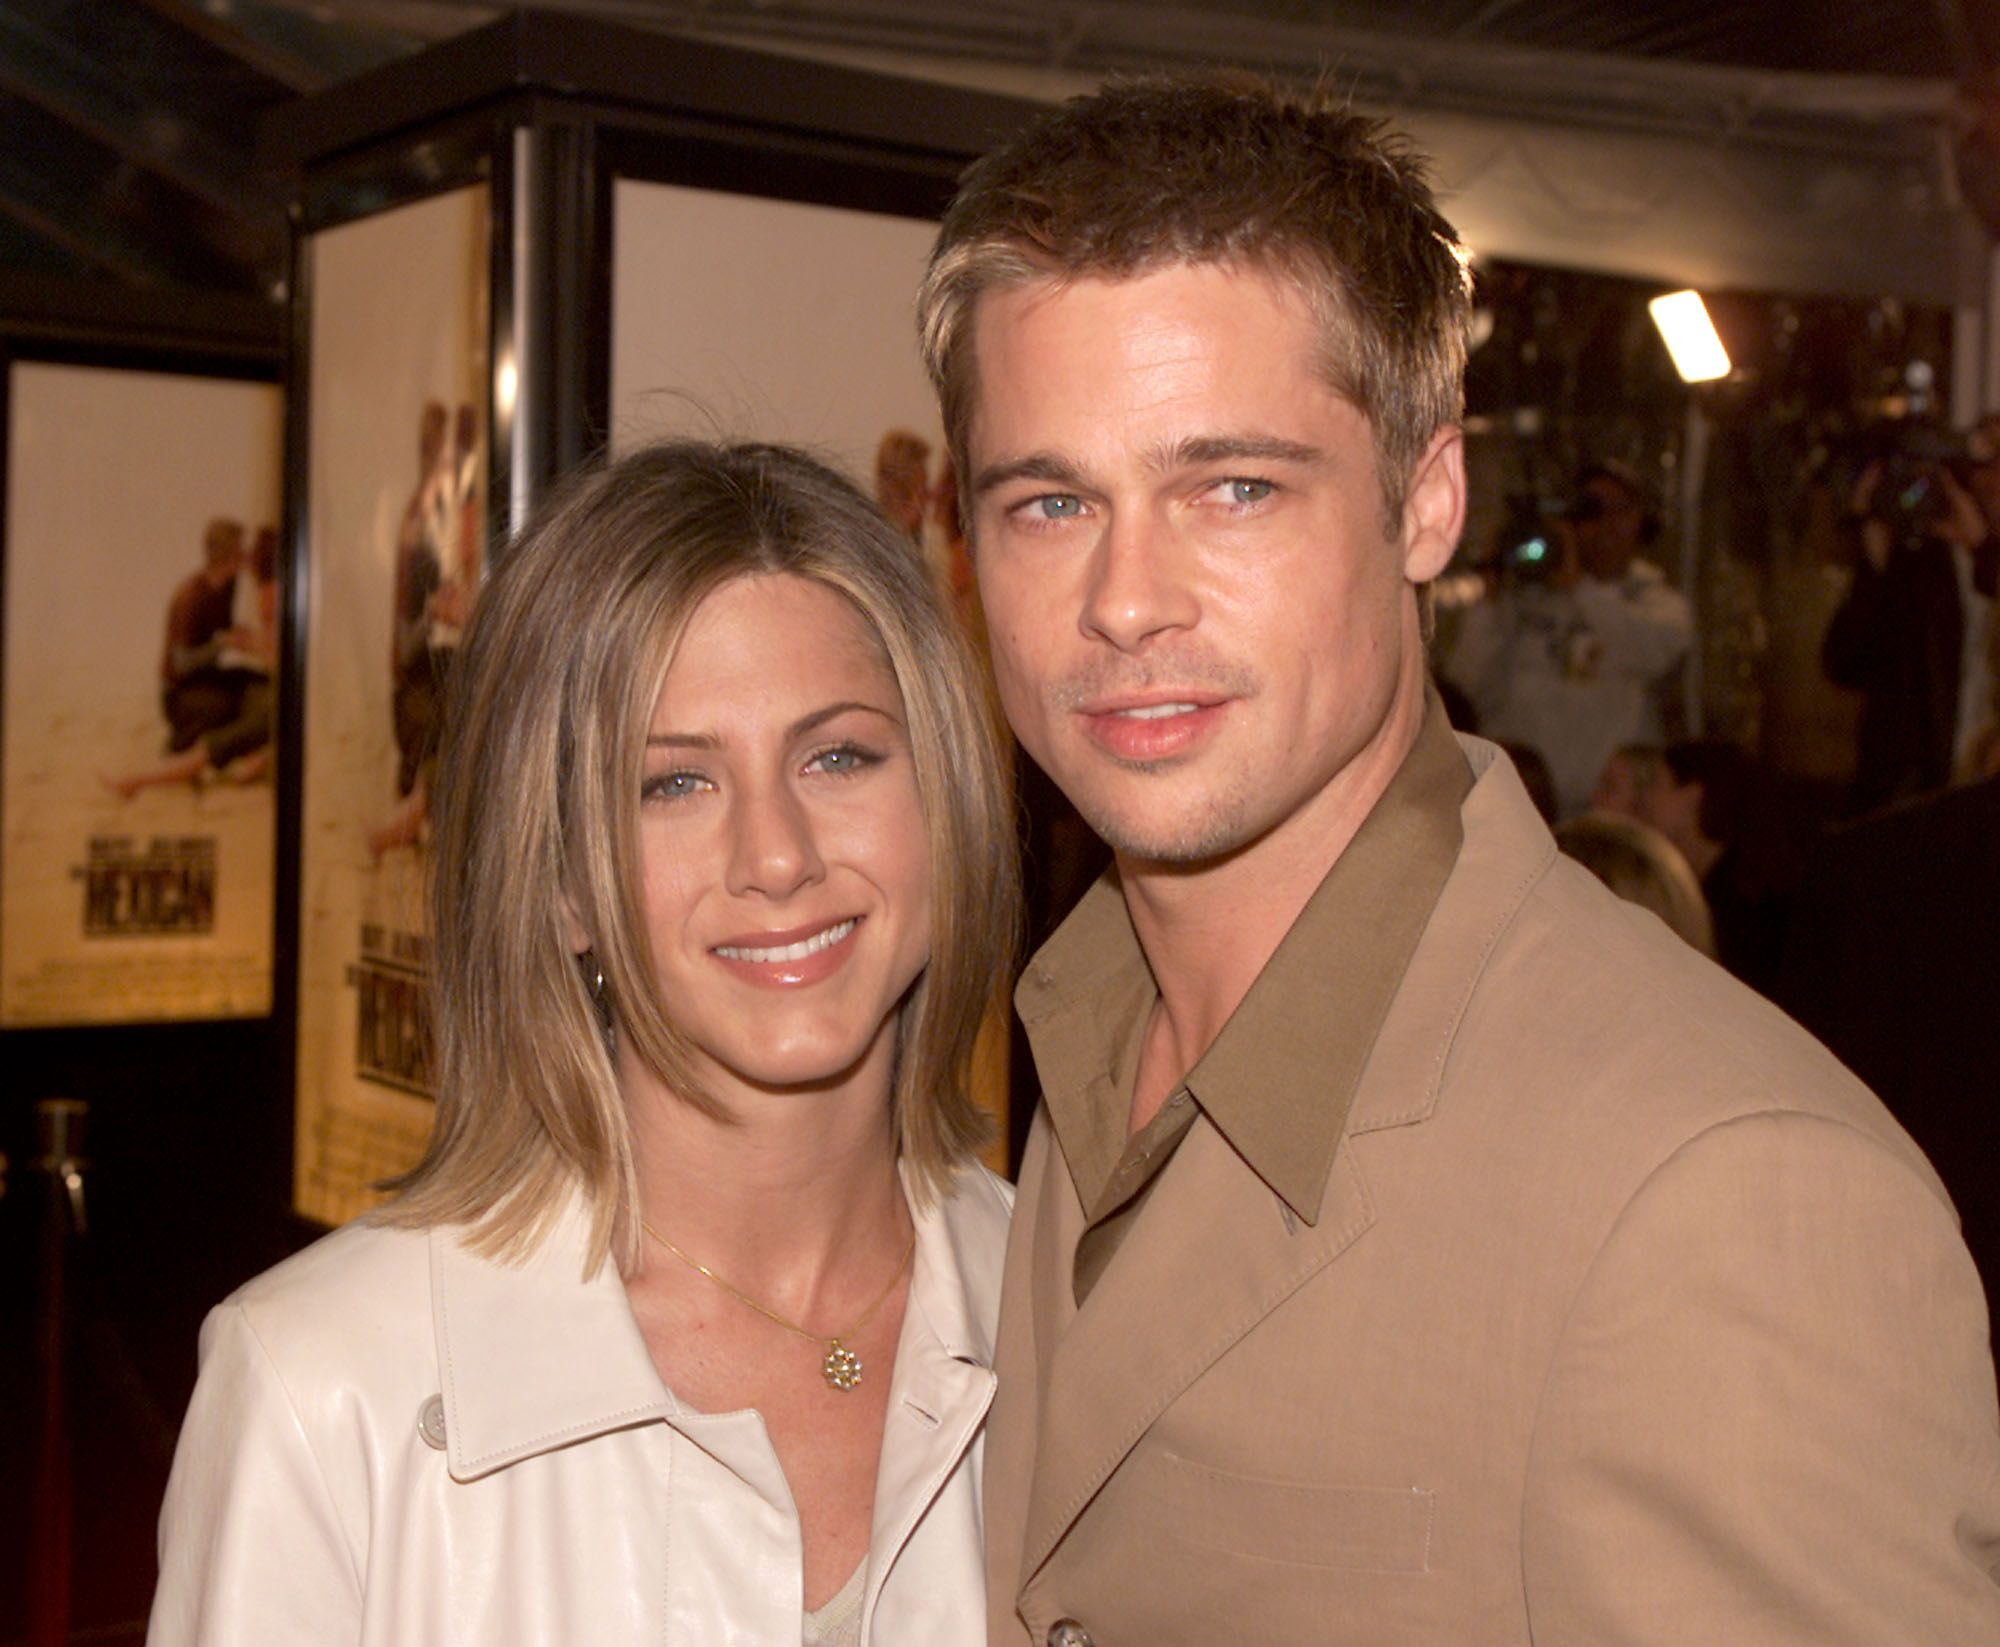 Hoe is Jennifer Aniston datingonline dating site Christian